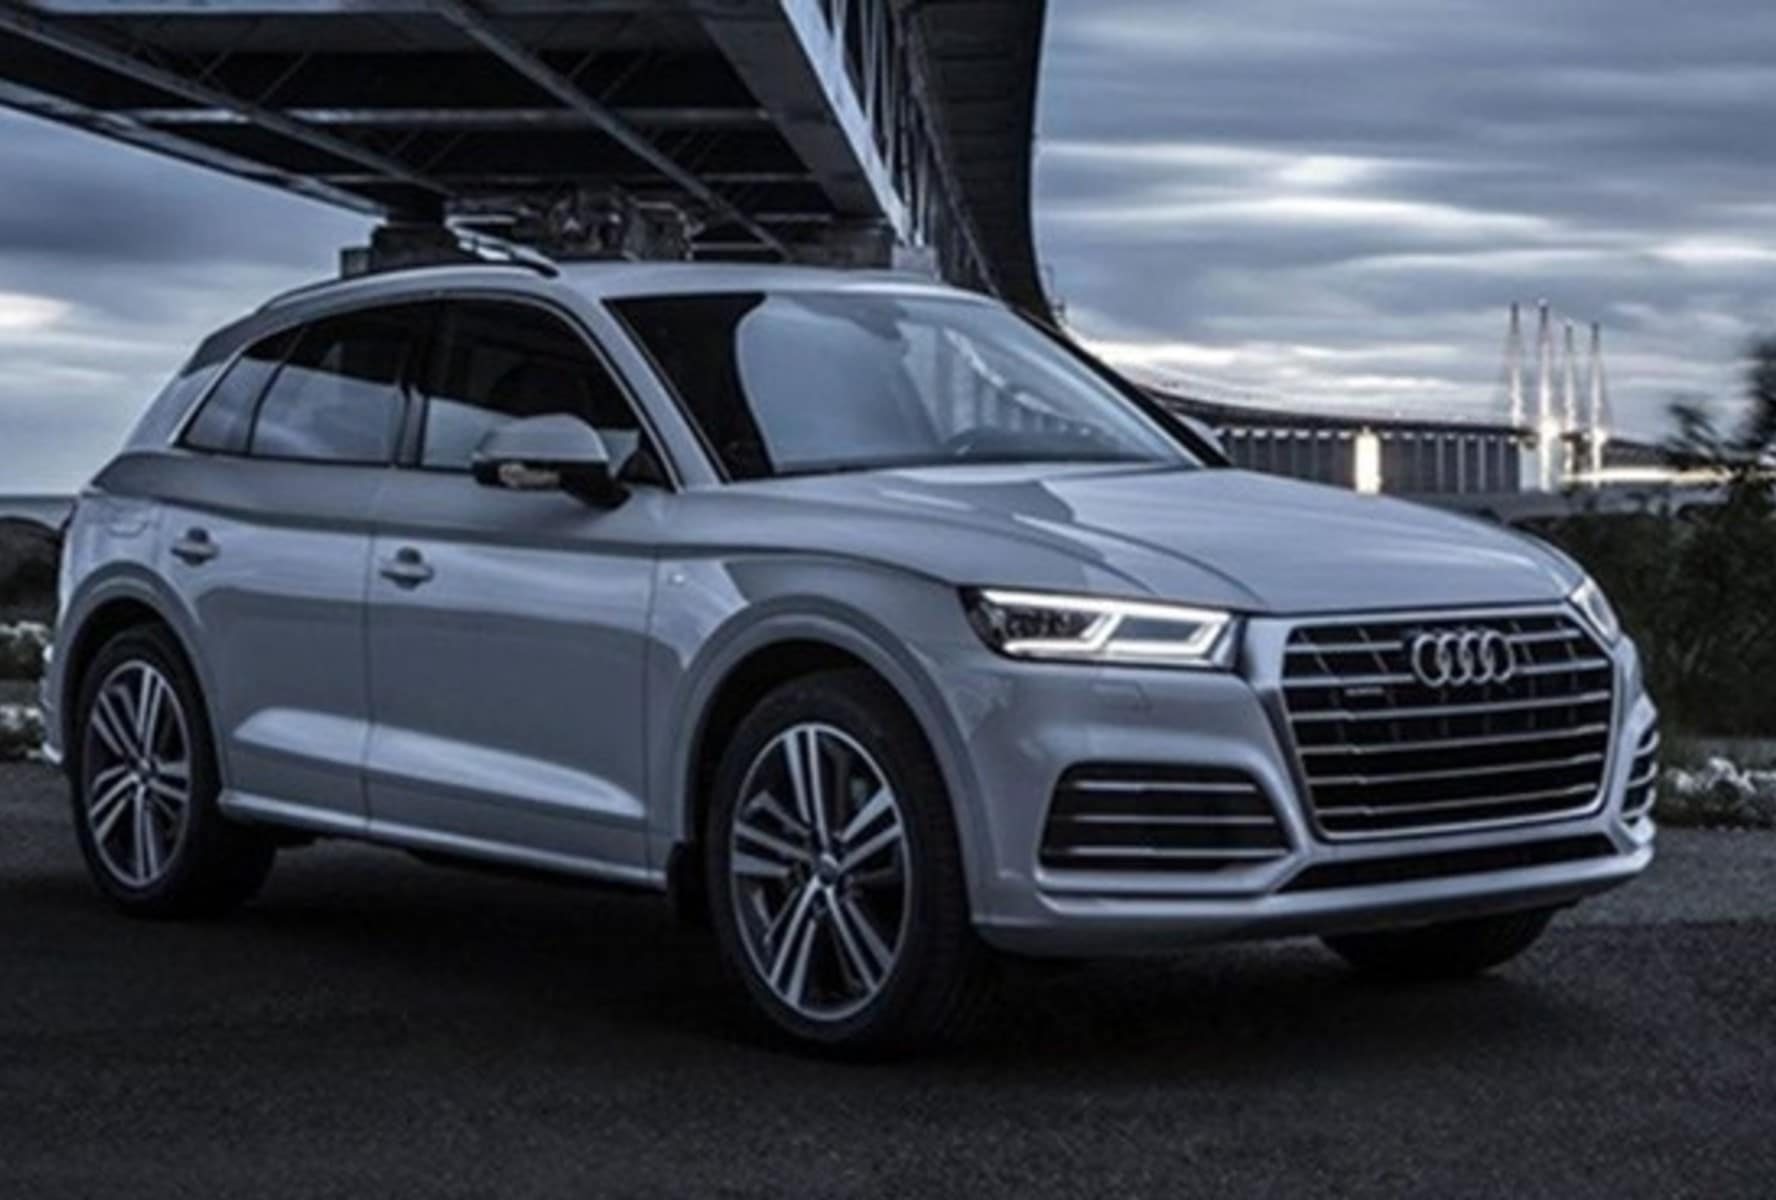 2019 Audi Q5 Exterior Side view